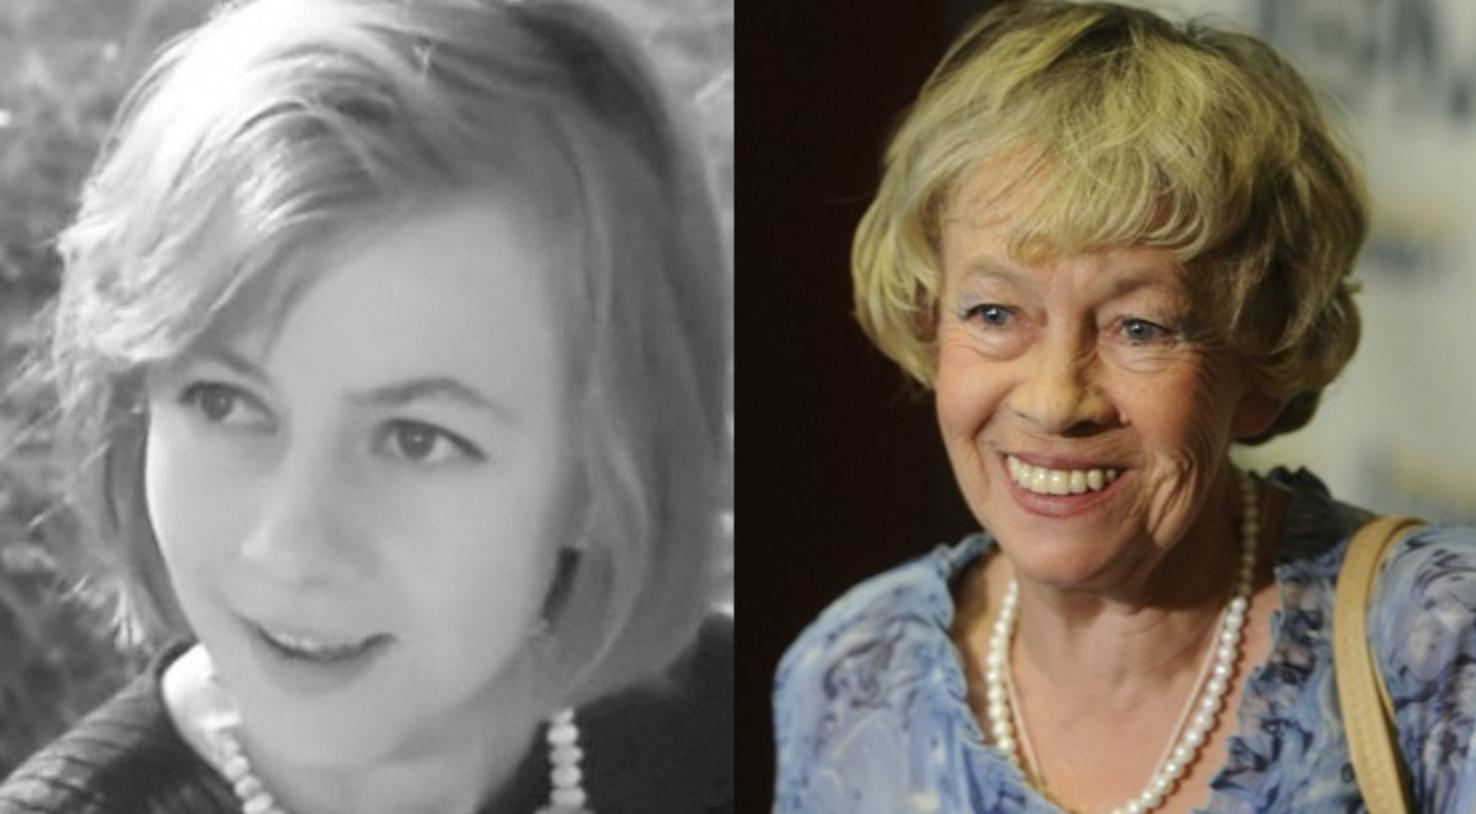 ТОП-5 редких фото российских актрис старше 70 лет актриса,звезда,кино,наши звезды,фильм,фото,шоубиz,шоубиз